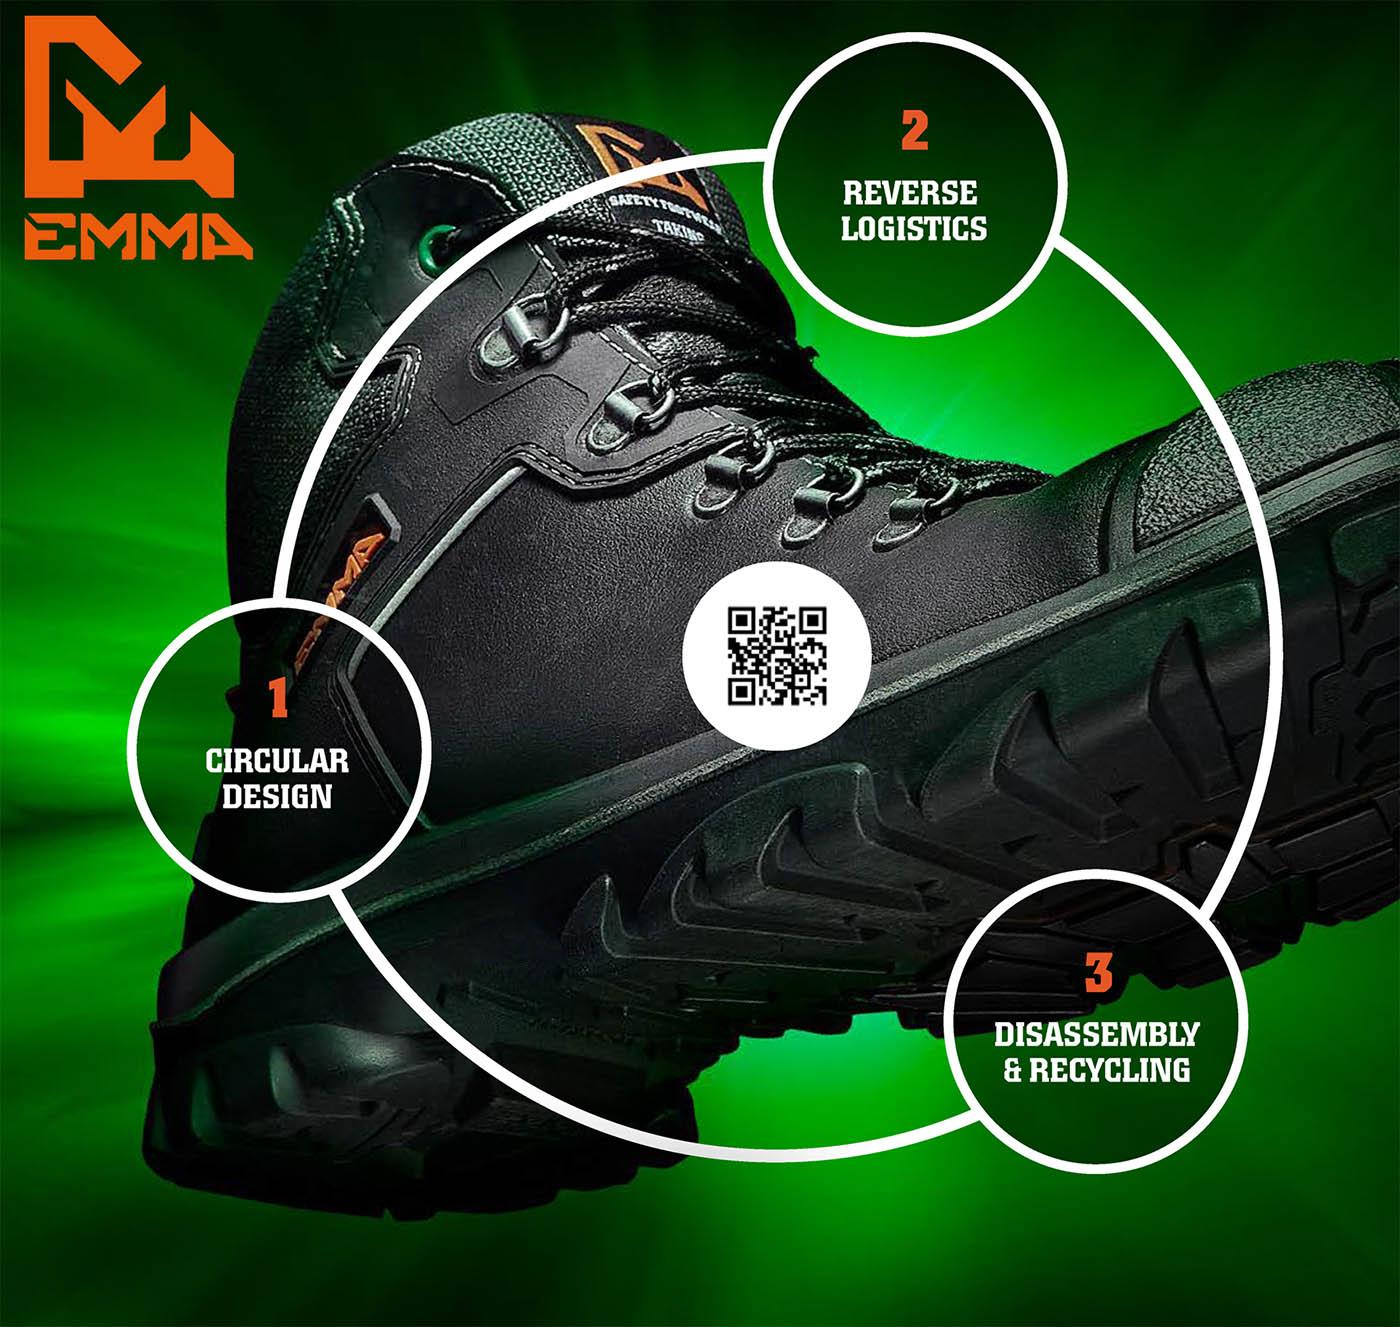 EMMA Responsible Safety Footwear